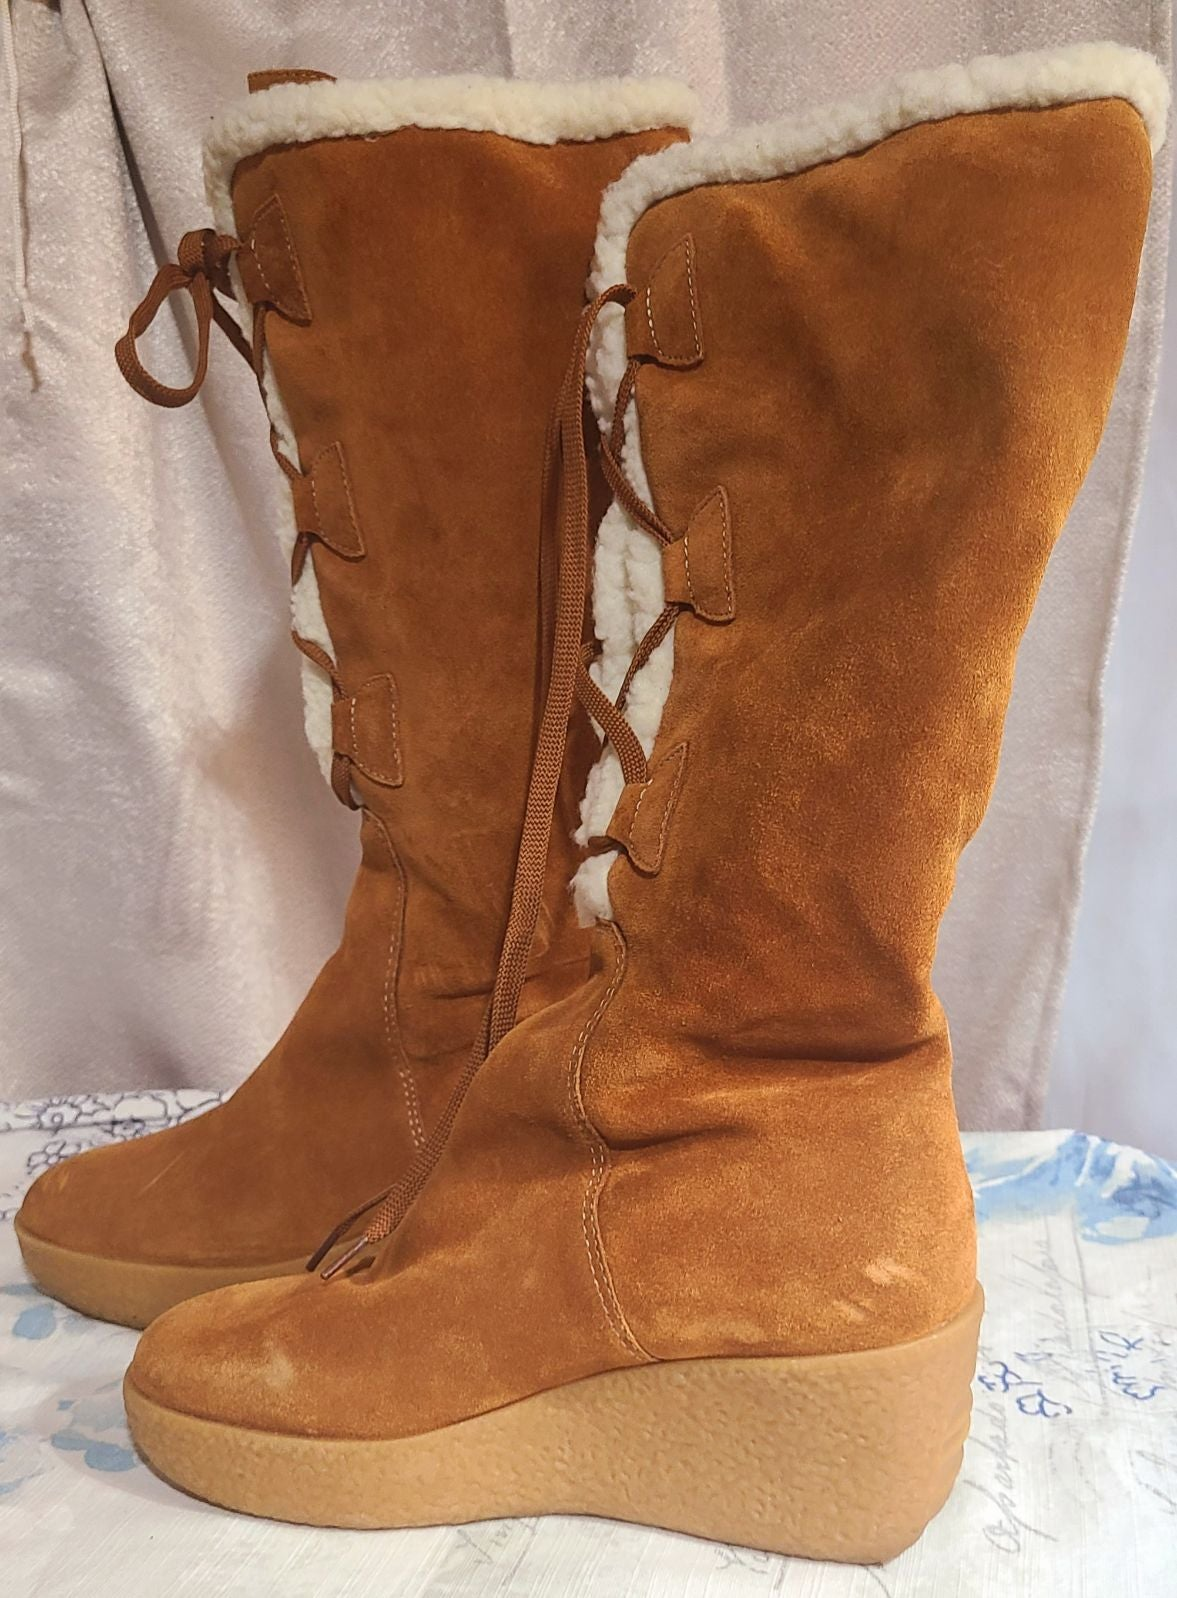 Michael Kors Womens Boots